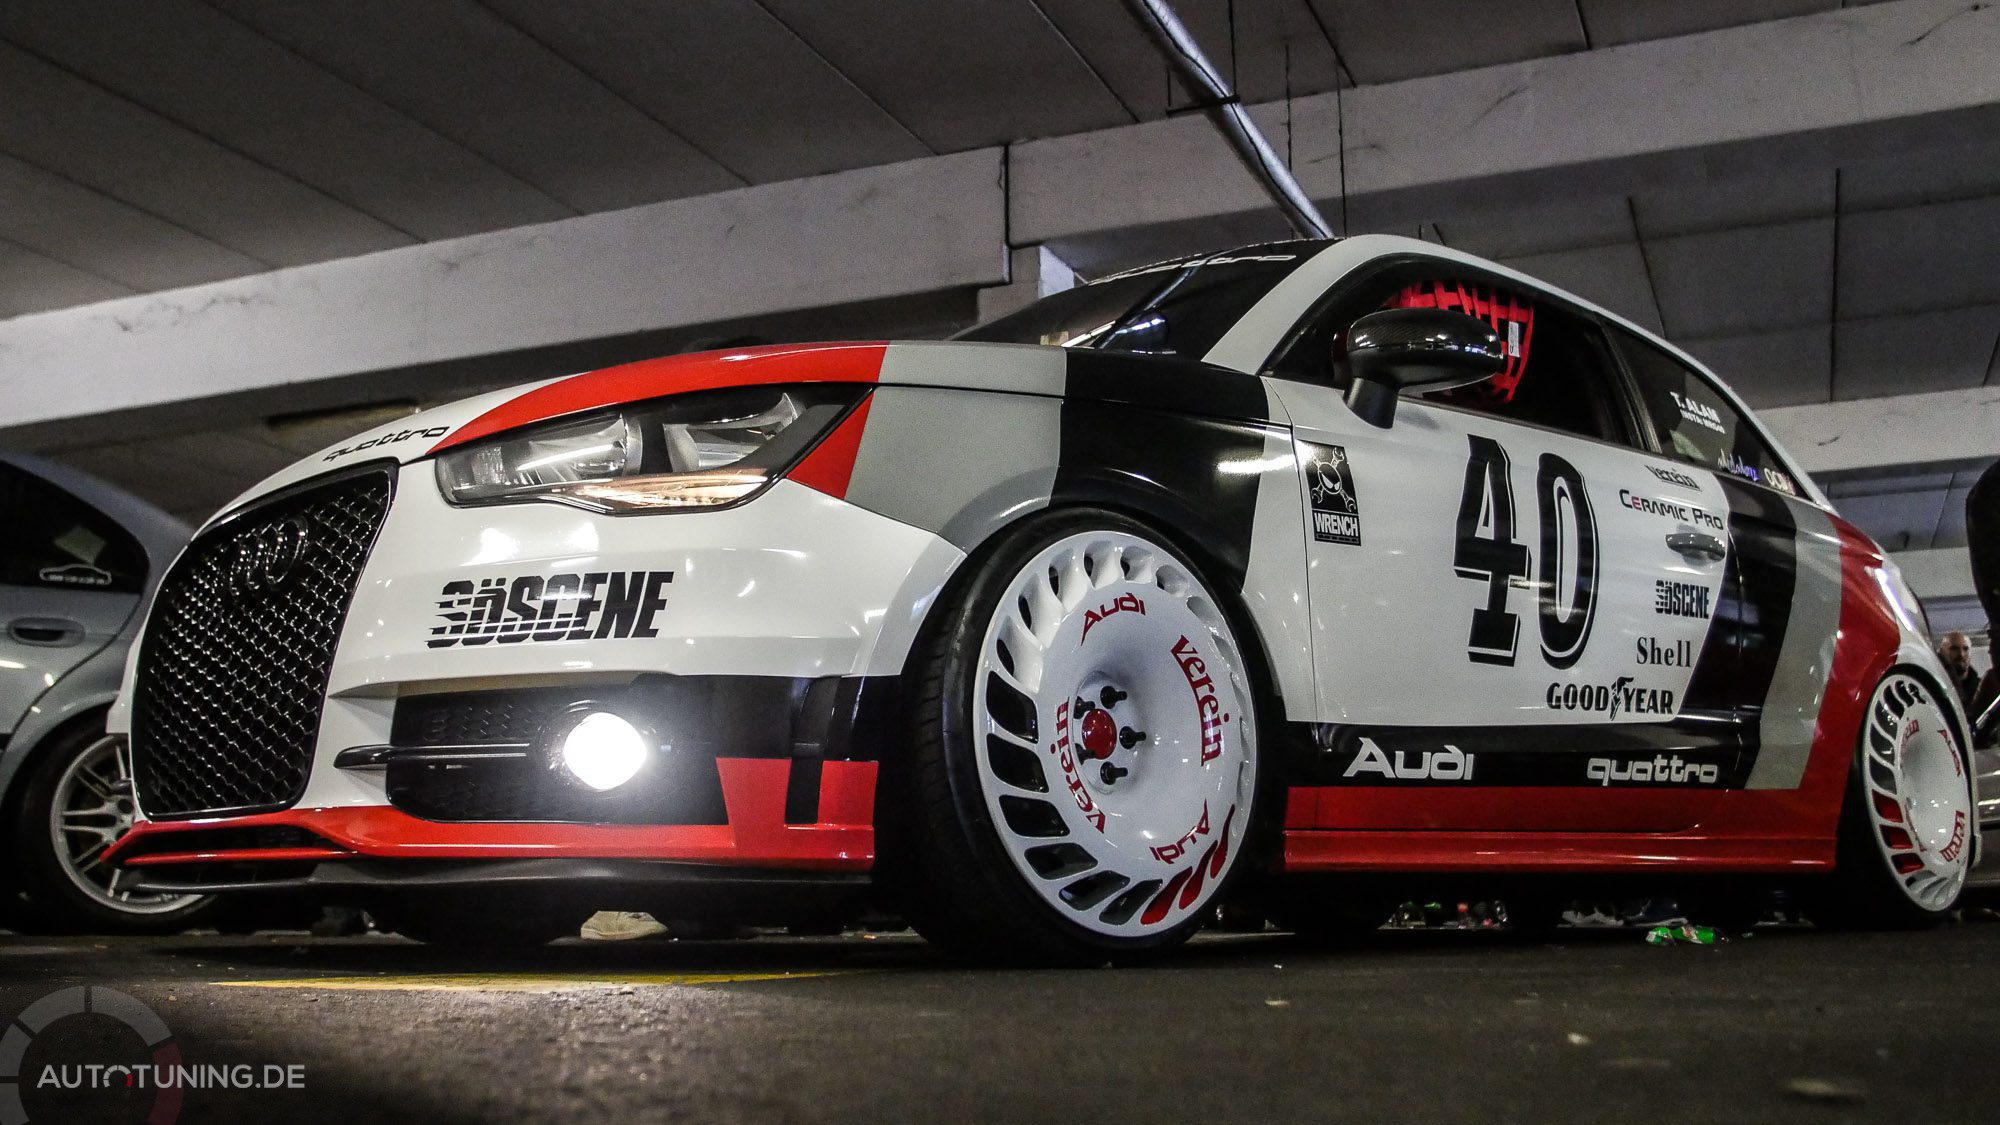 Getunter Audi im Racing-Style!